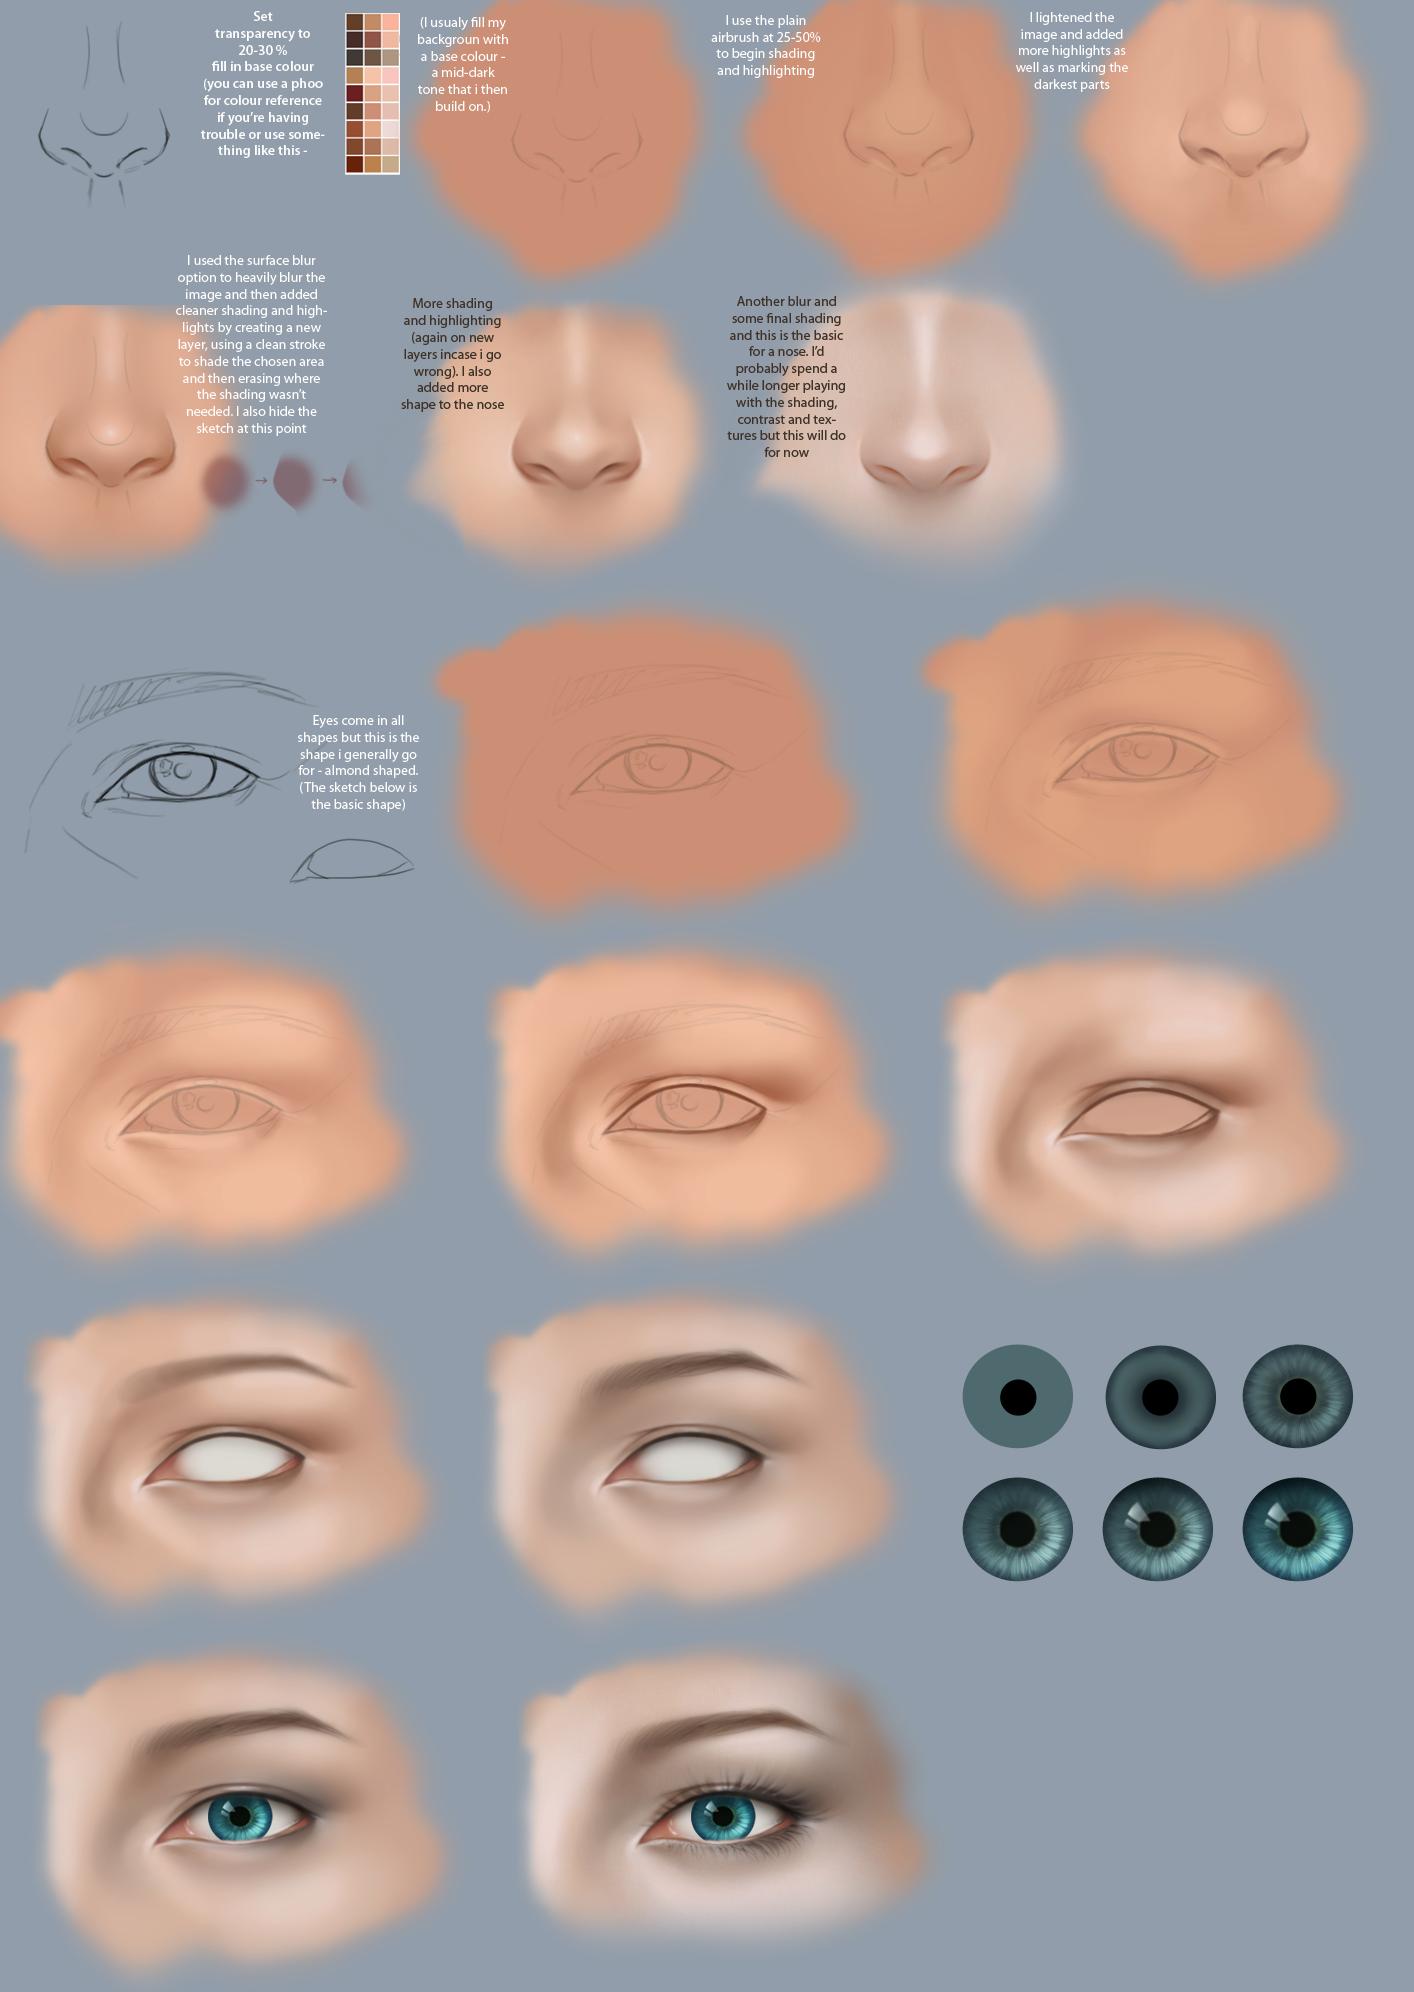 Nose and Eyes by gothic-icecream.deviantart.com on @deviantART